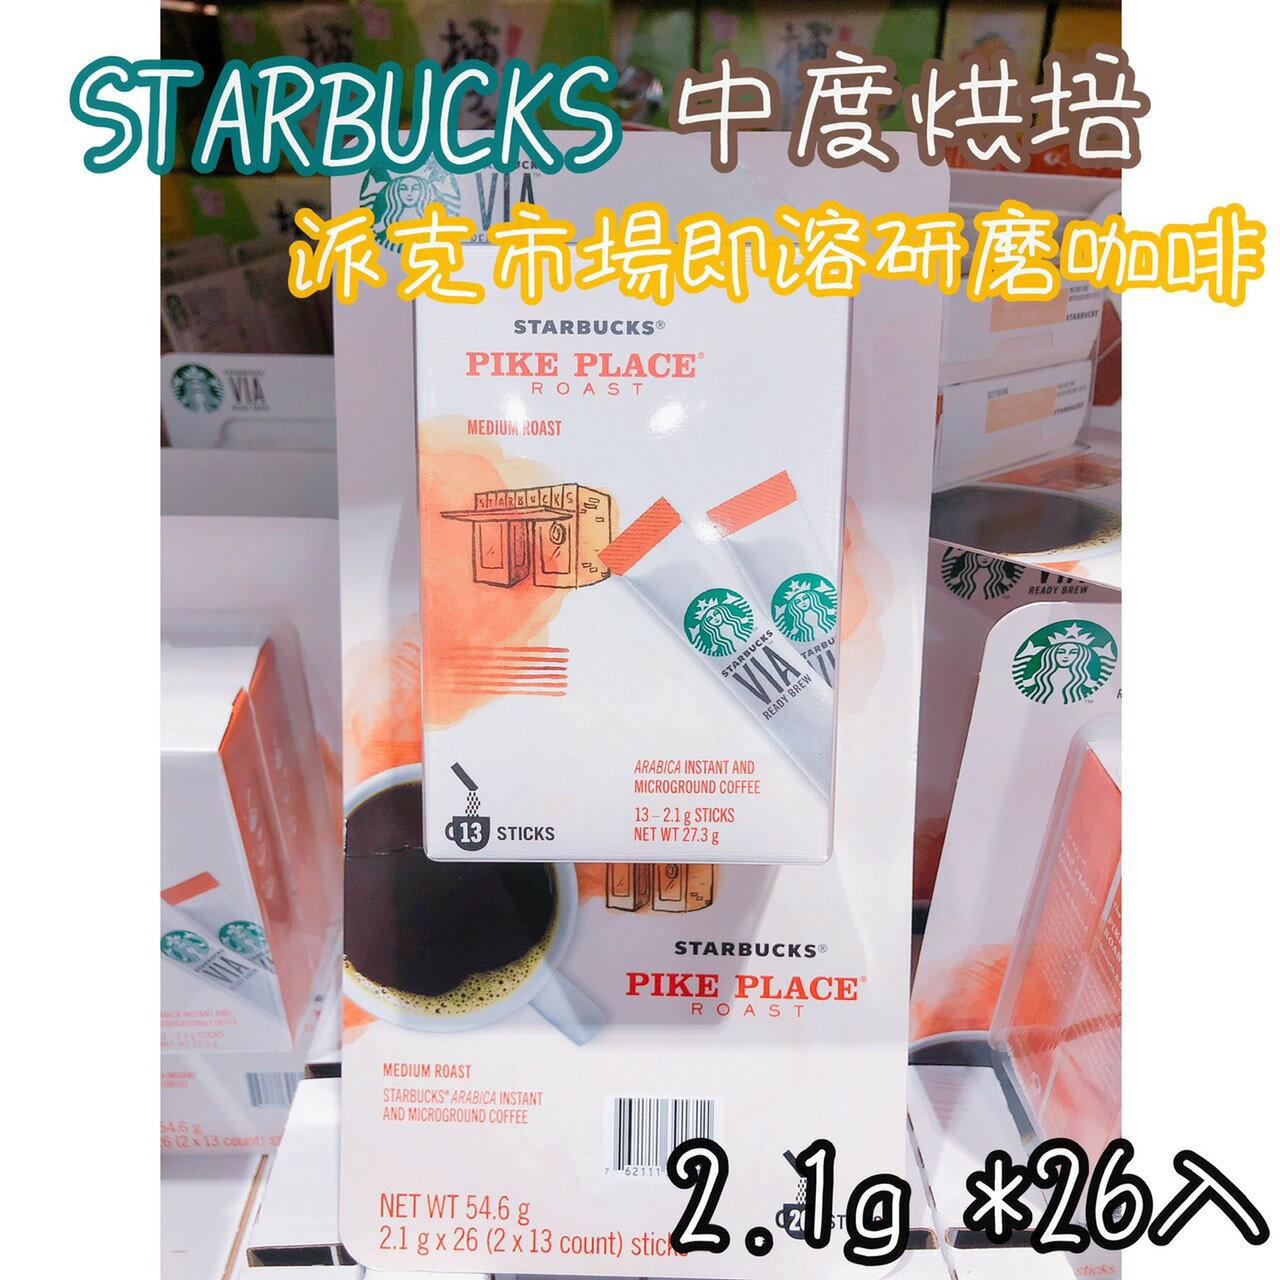 Starbucks Via 派克市場即溶研磨咖啡 2.1g*26入 好市多 即溶研磨咖啡 中度烘培 阿拉比卡咖啡豆 即溶